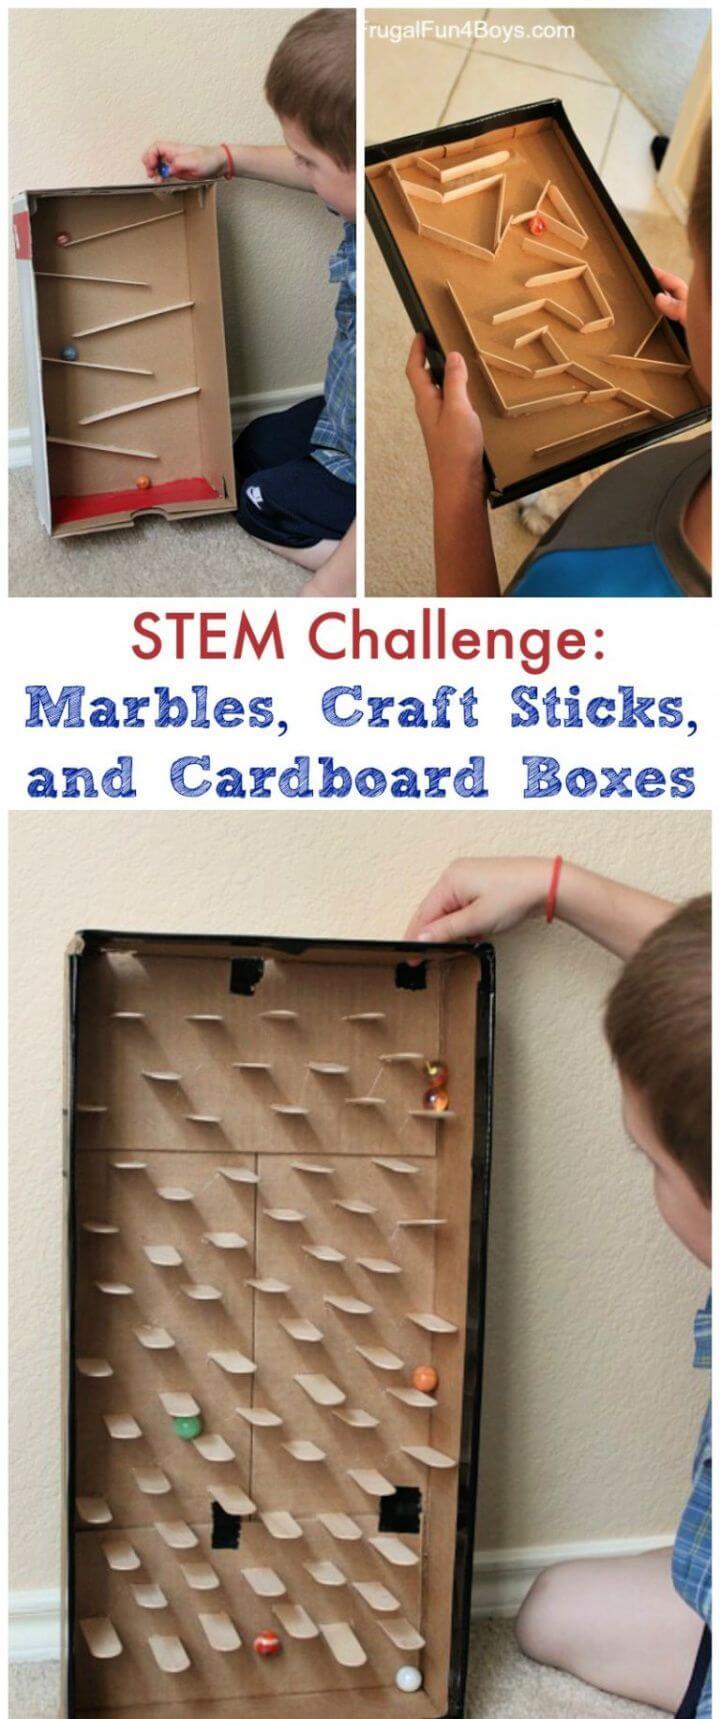 Build A DIY Marble Run With Craft Sticks